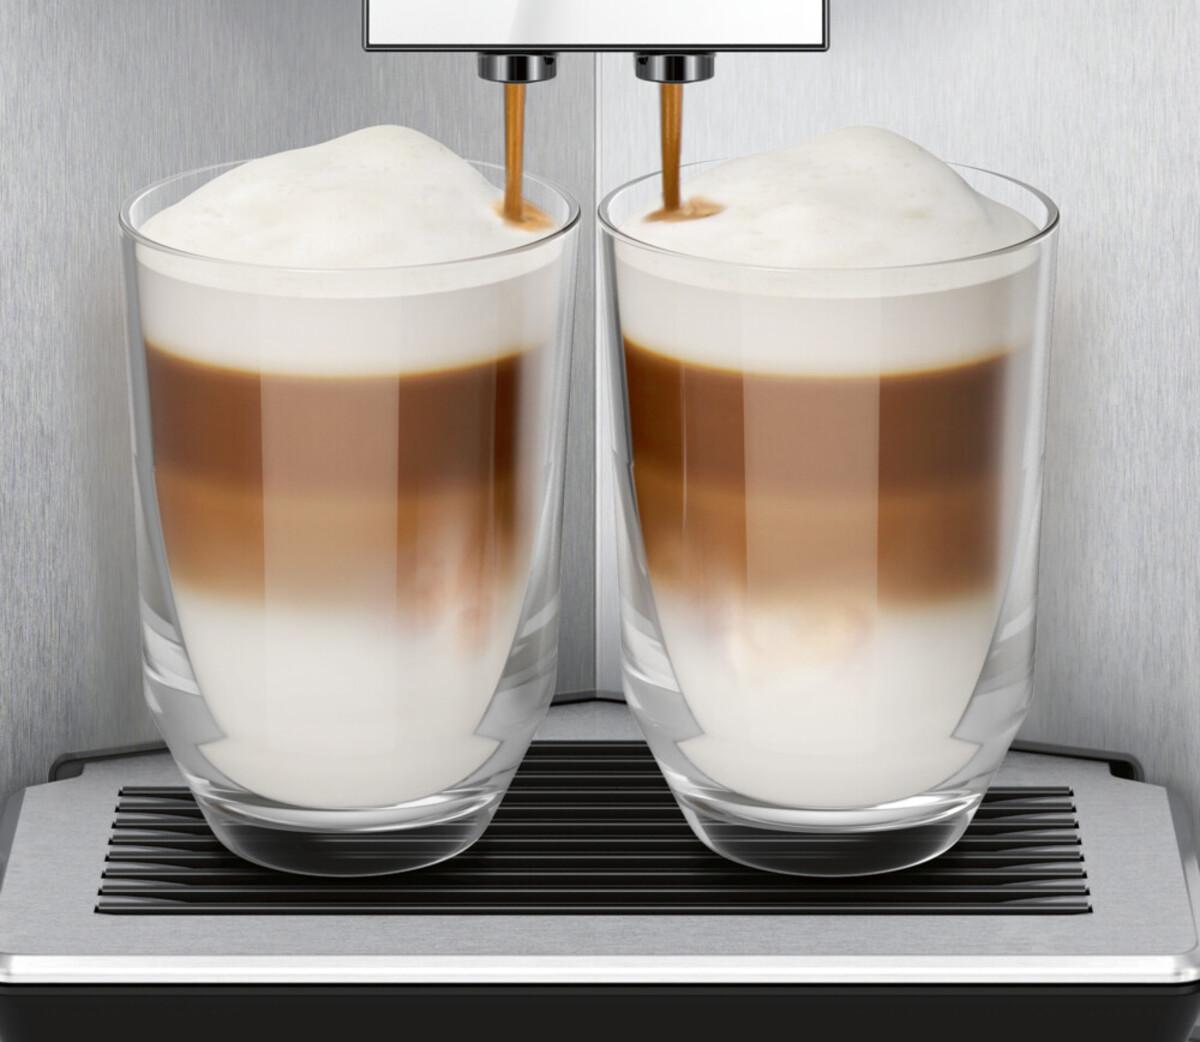 Bild 3 von EQ.9 plus connect s500 TI9558X1DE Edelstahl Kaffeevollautomat